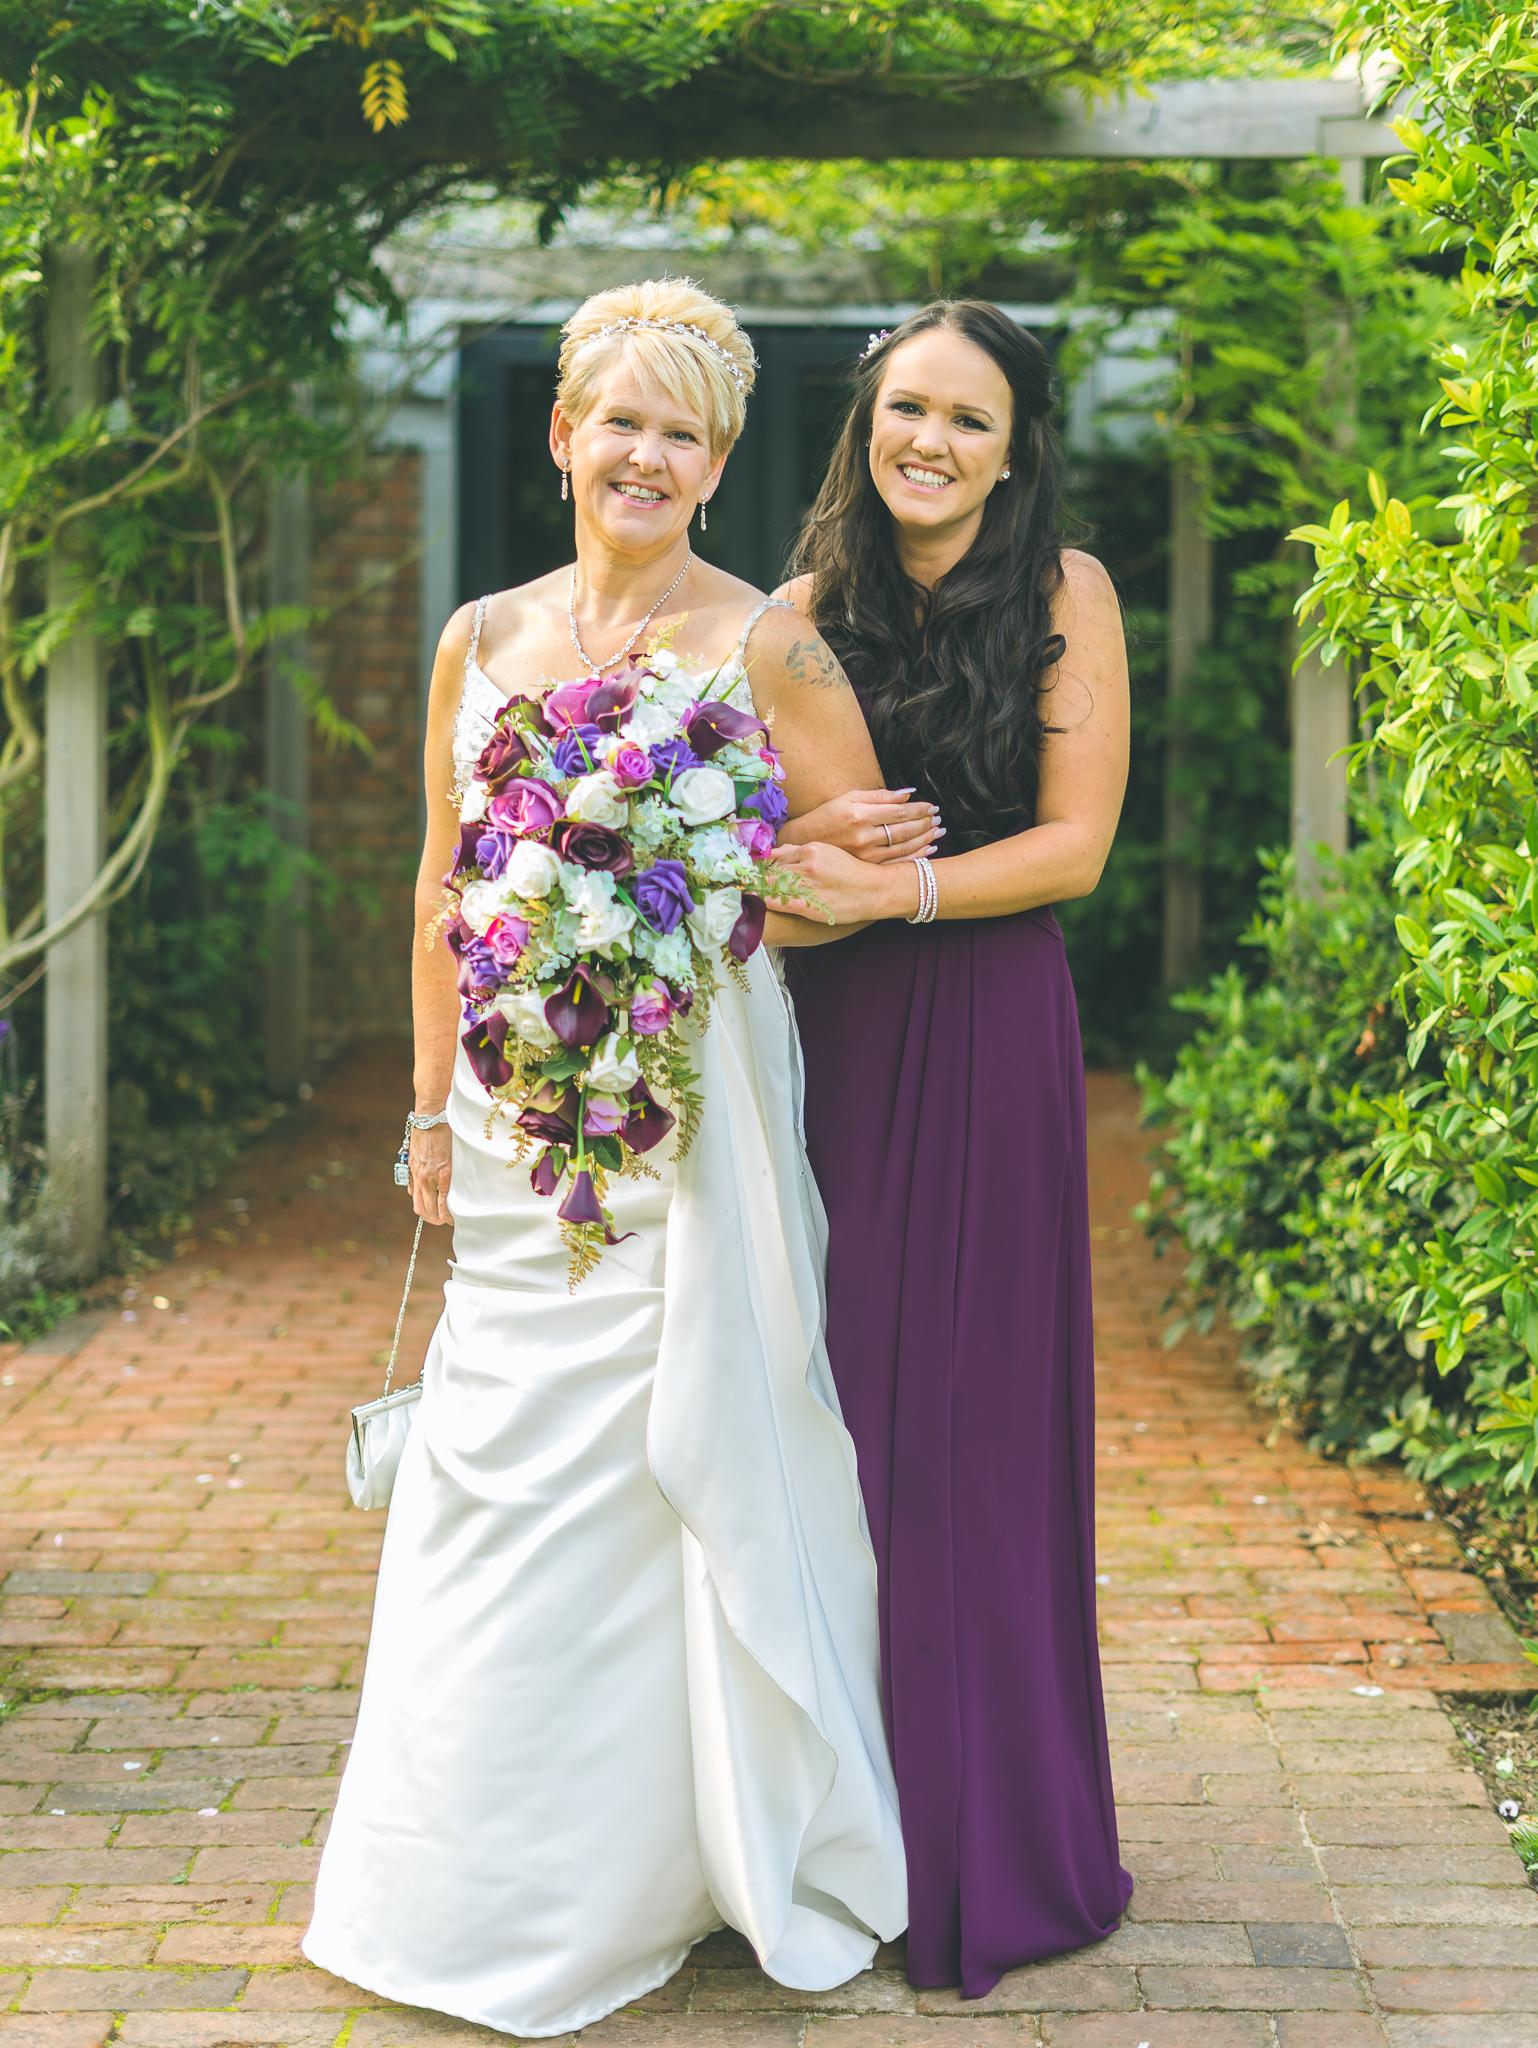 wedding_advert (22 of 29).jpg